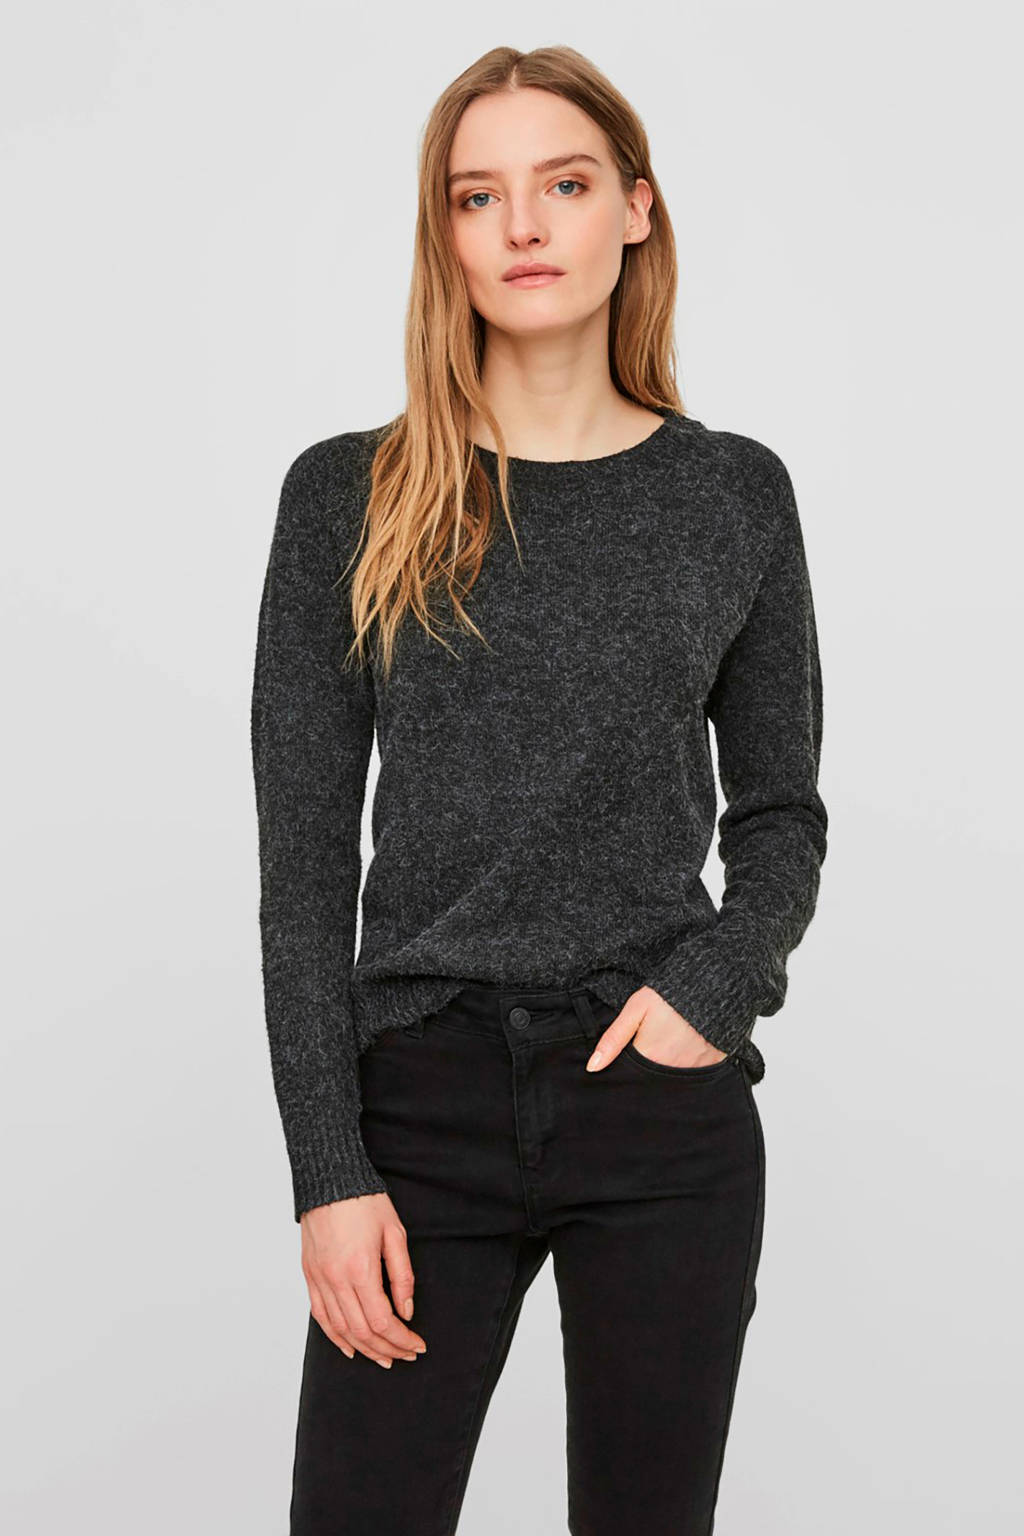 VERO MODA gemêleerde trui zwart, Zwart